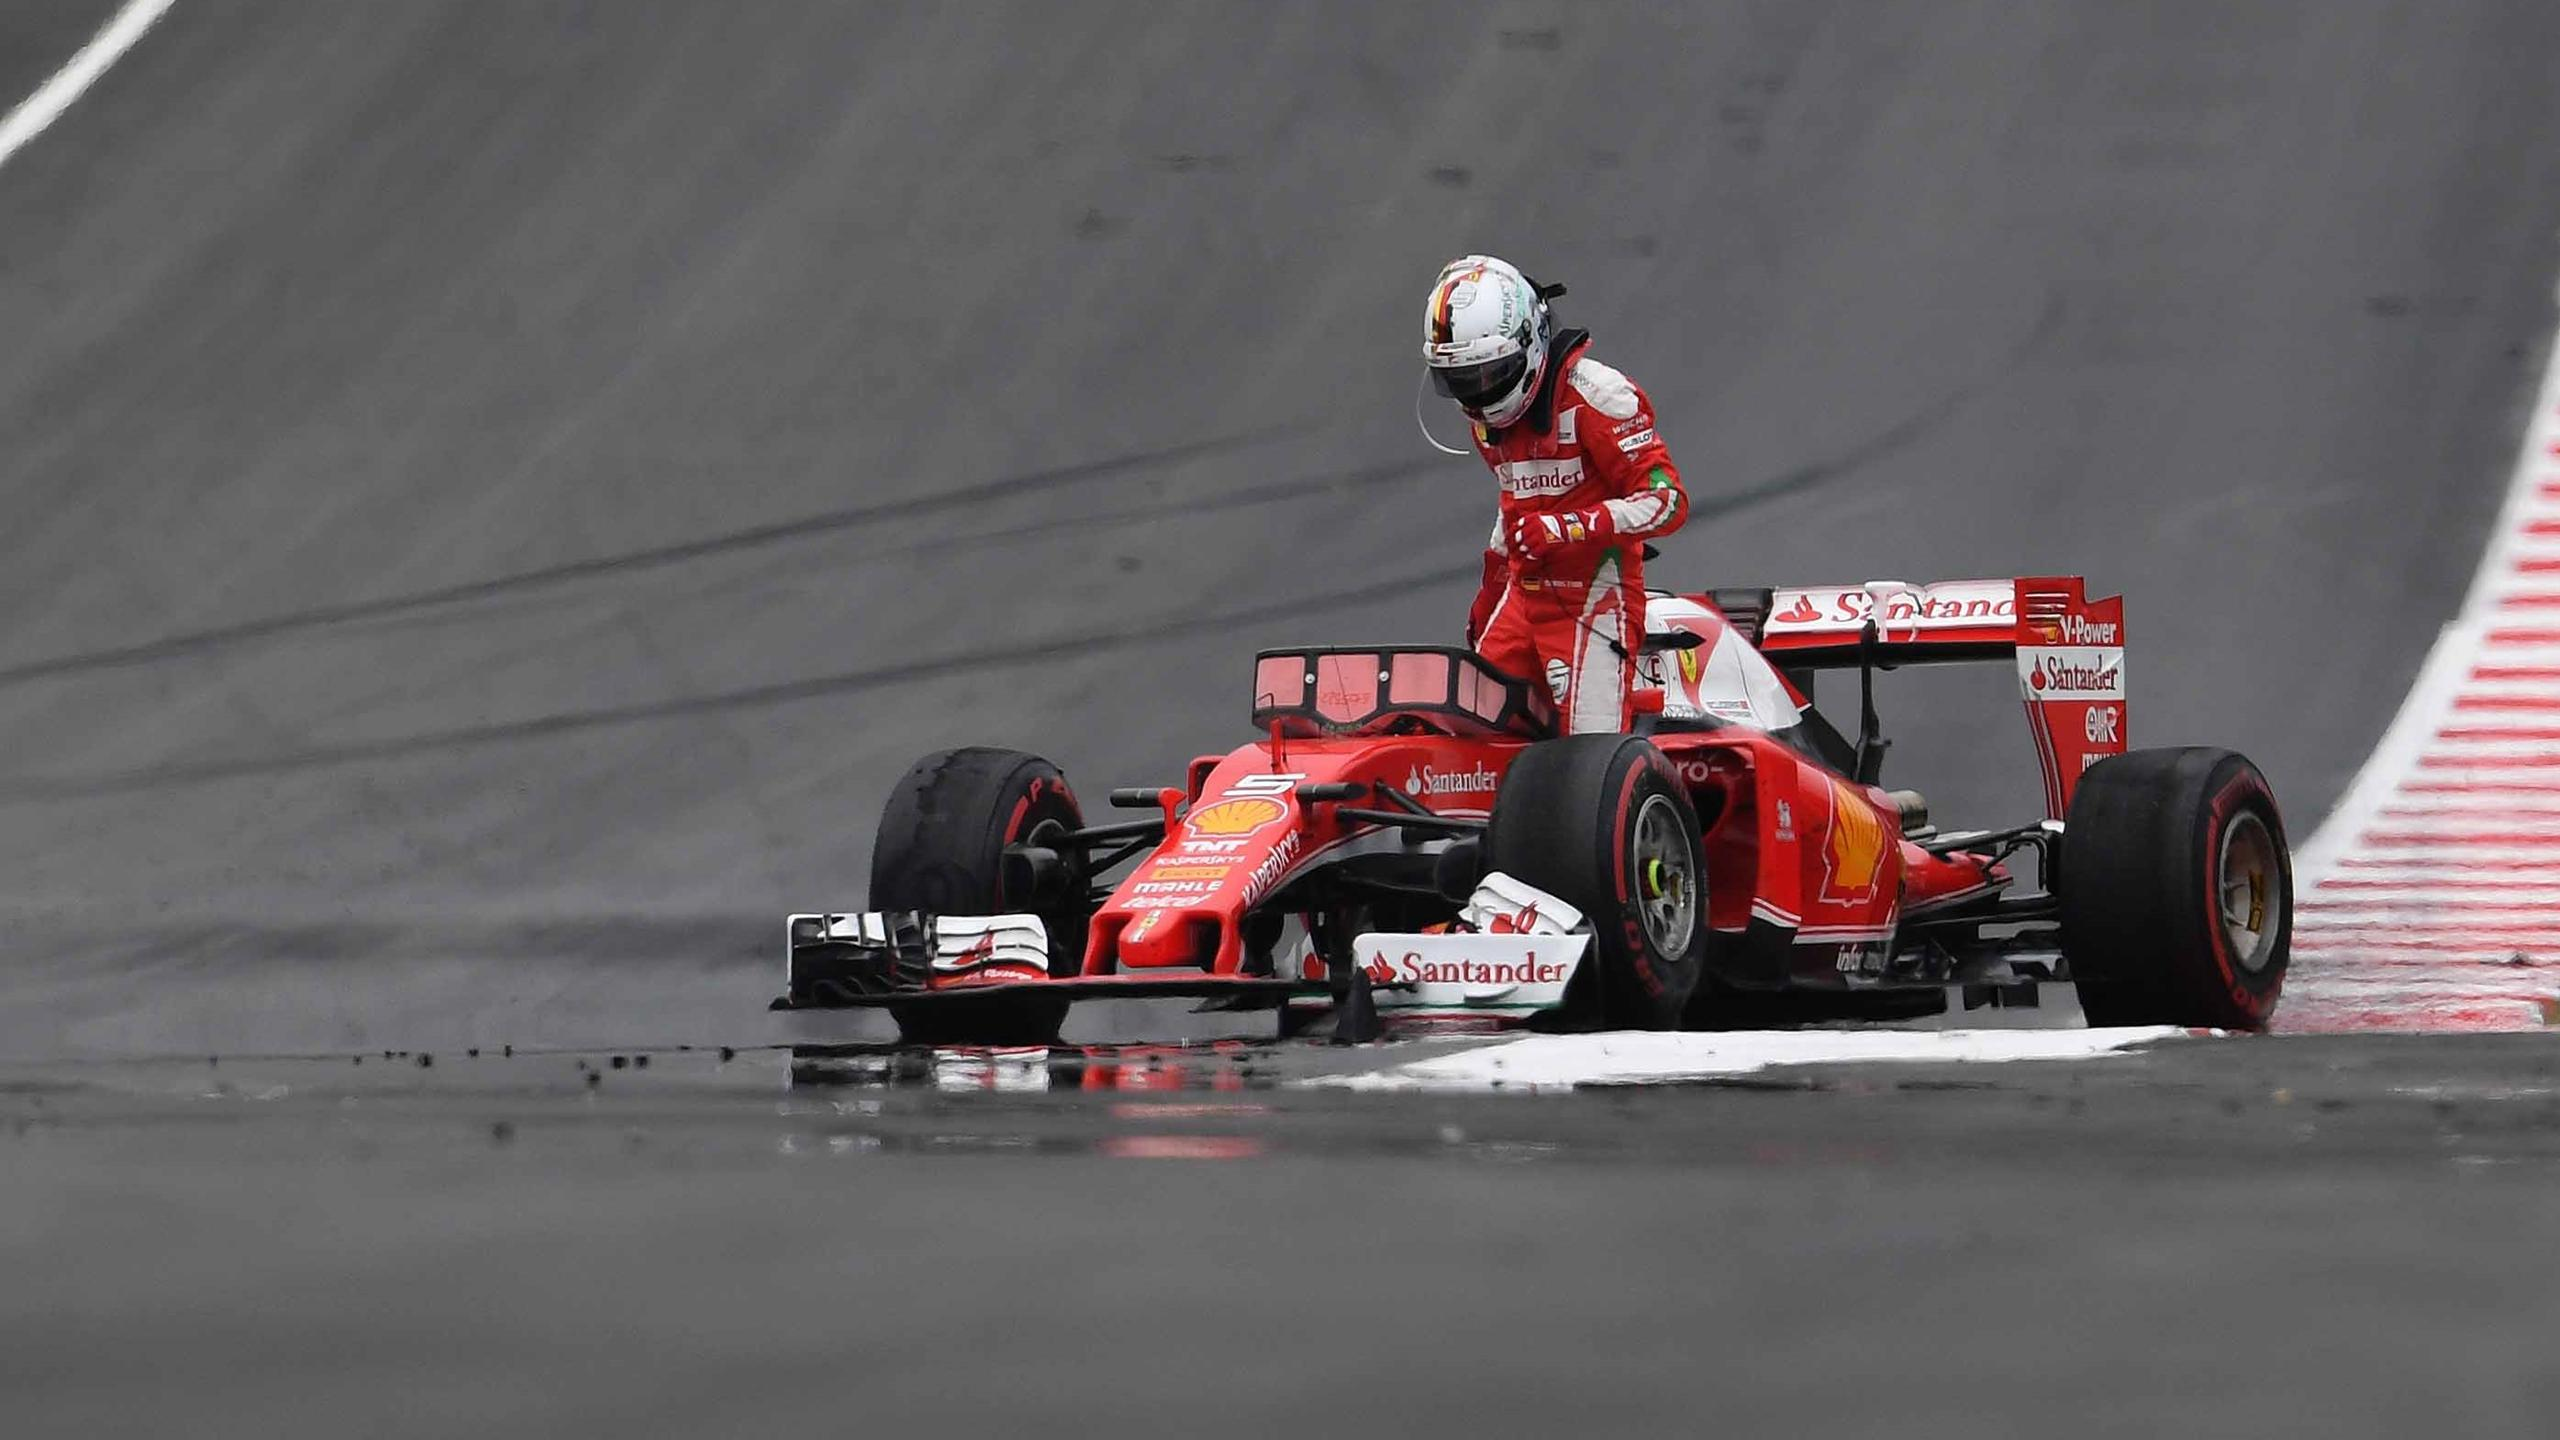 Sebastian Vettel (Ferrari) au Grand Prix d'Autriche 2016